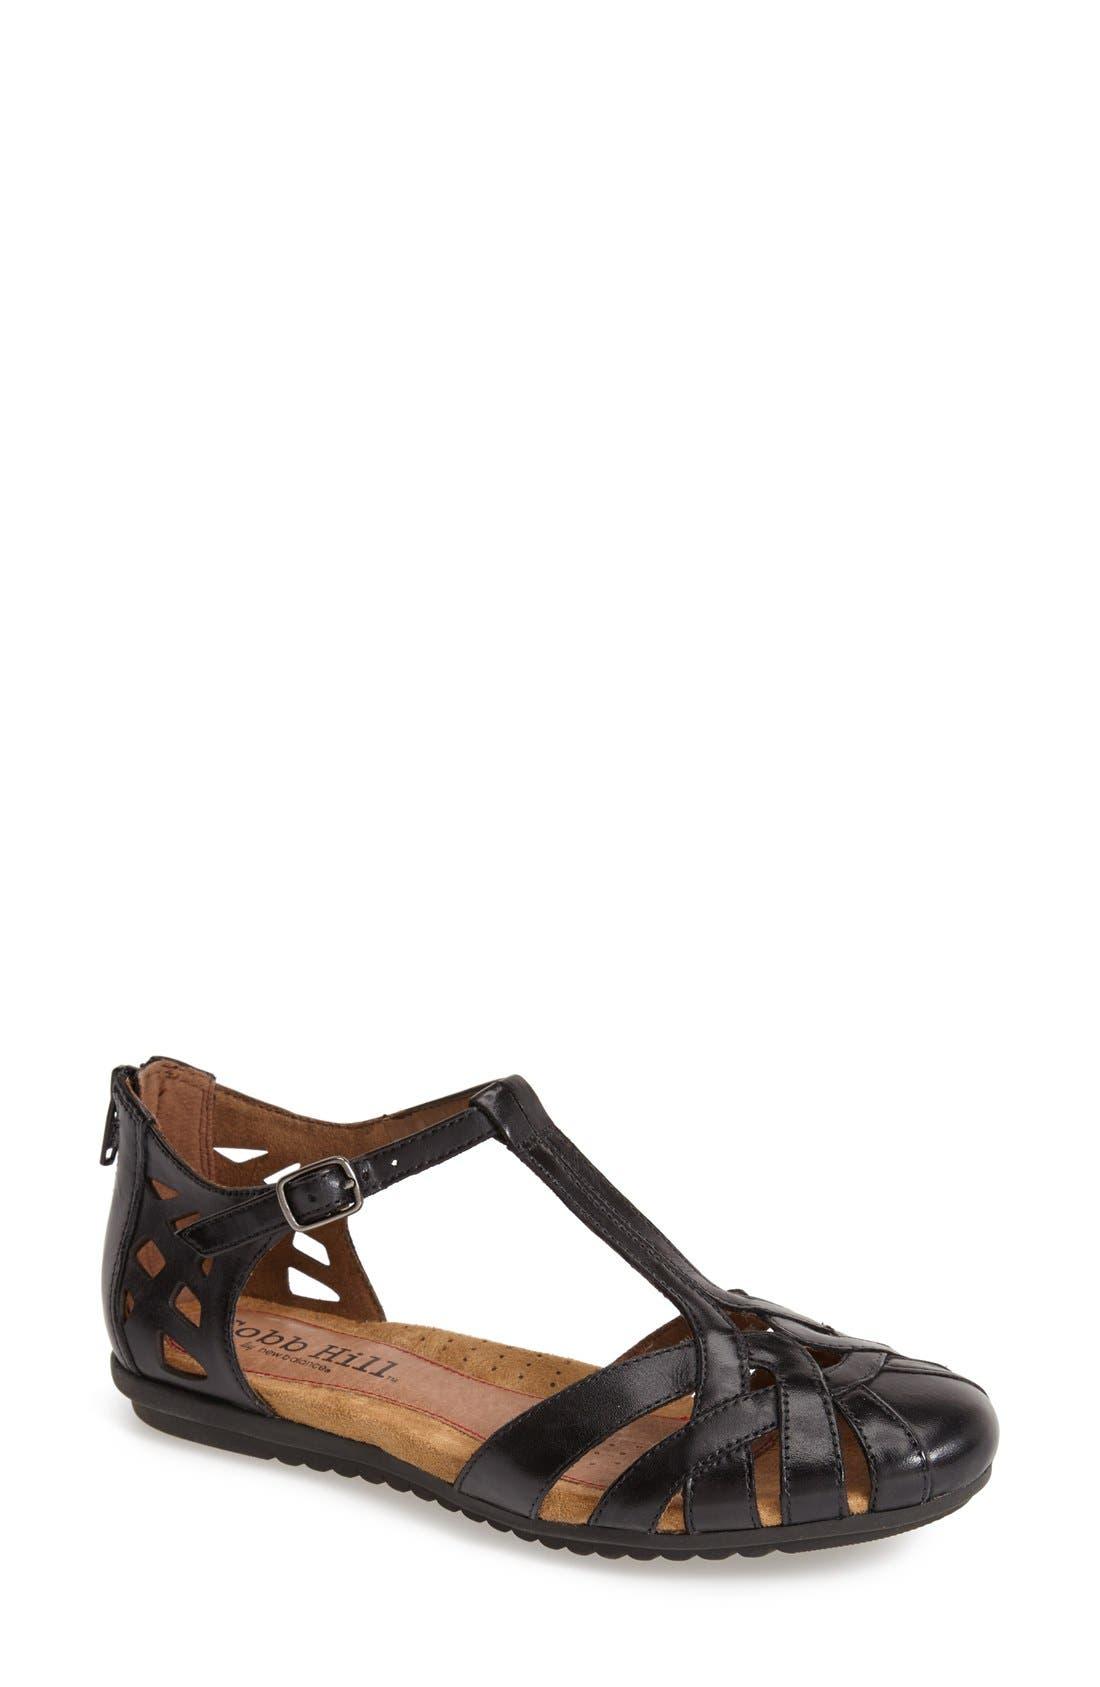 Rockport Cobb Hill 'Ireland' Leather Sandal (Women)